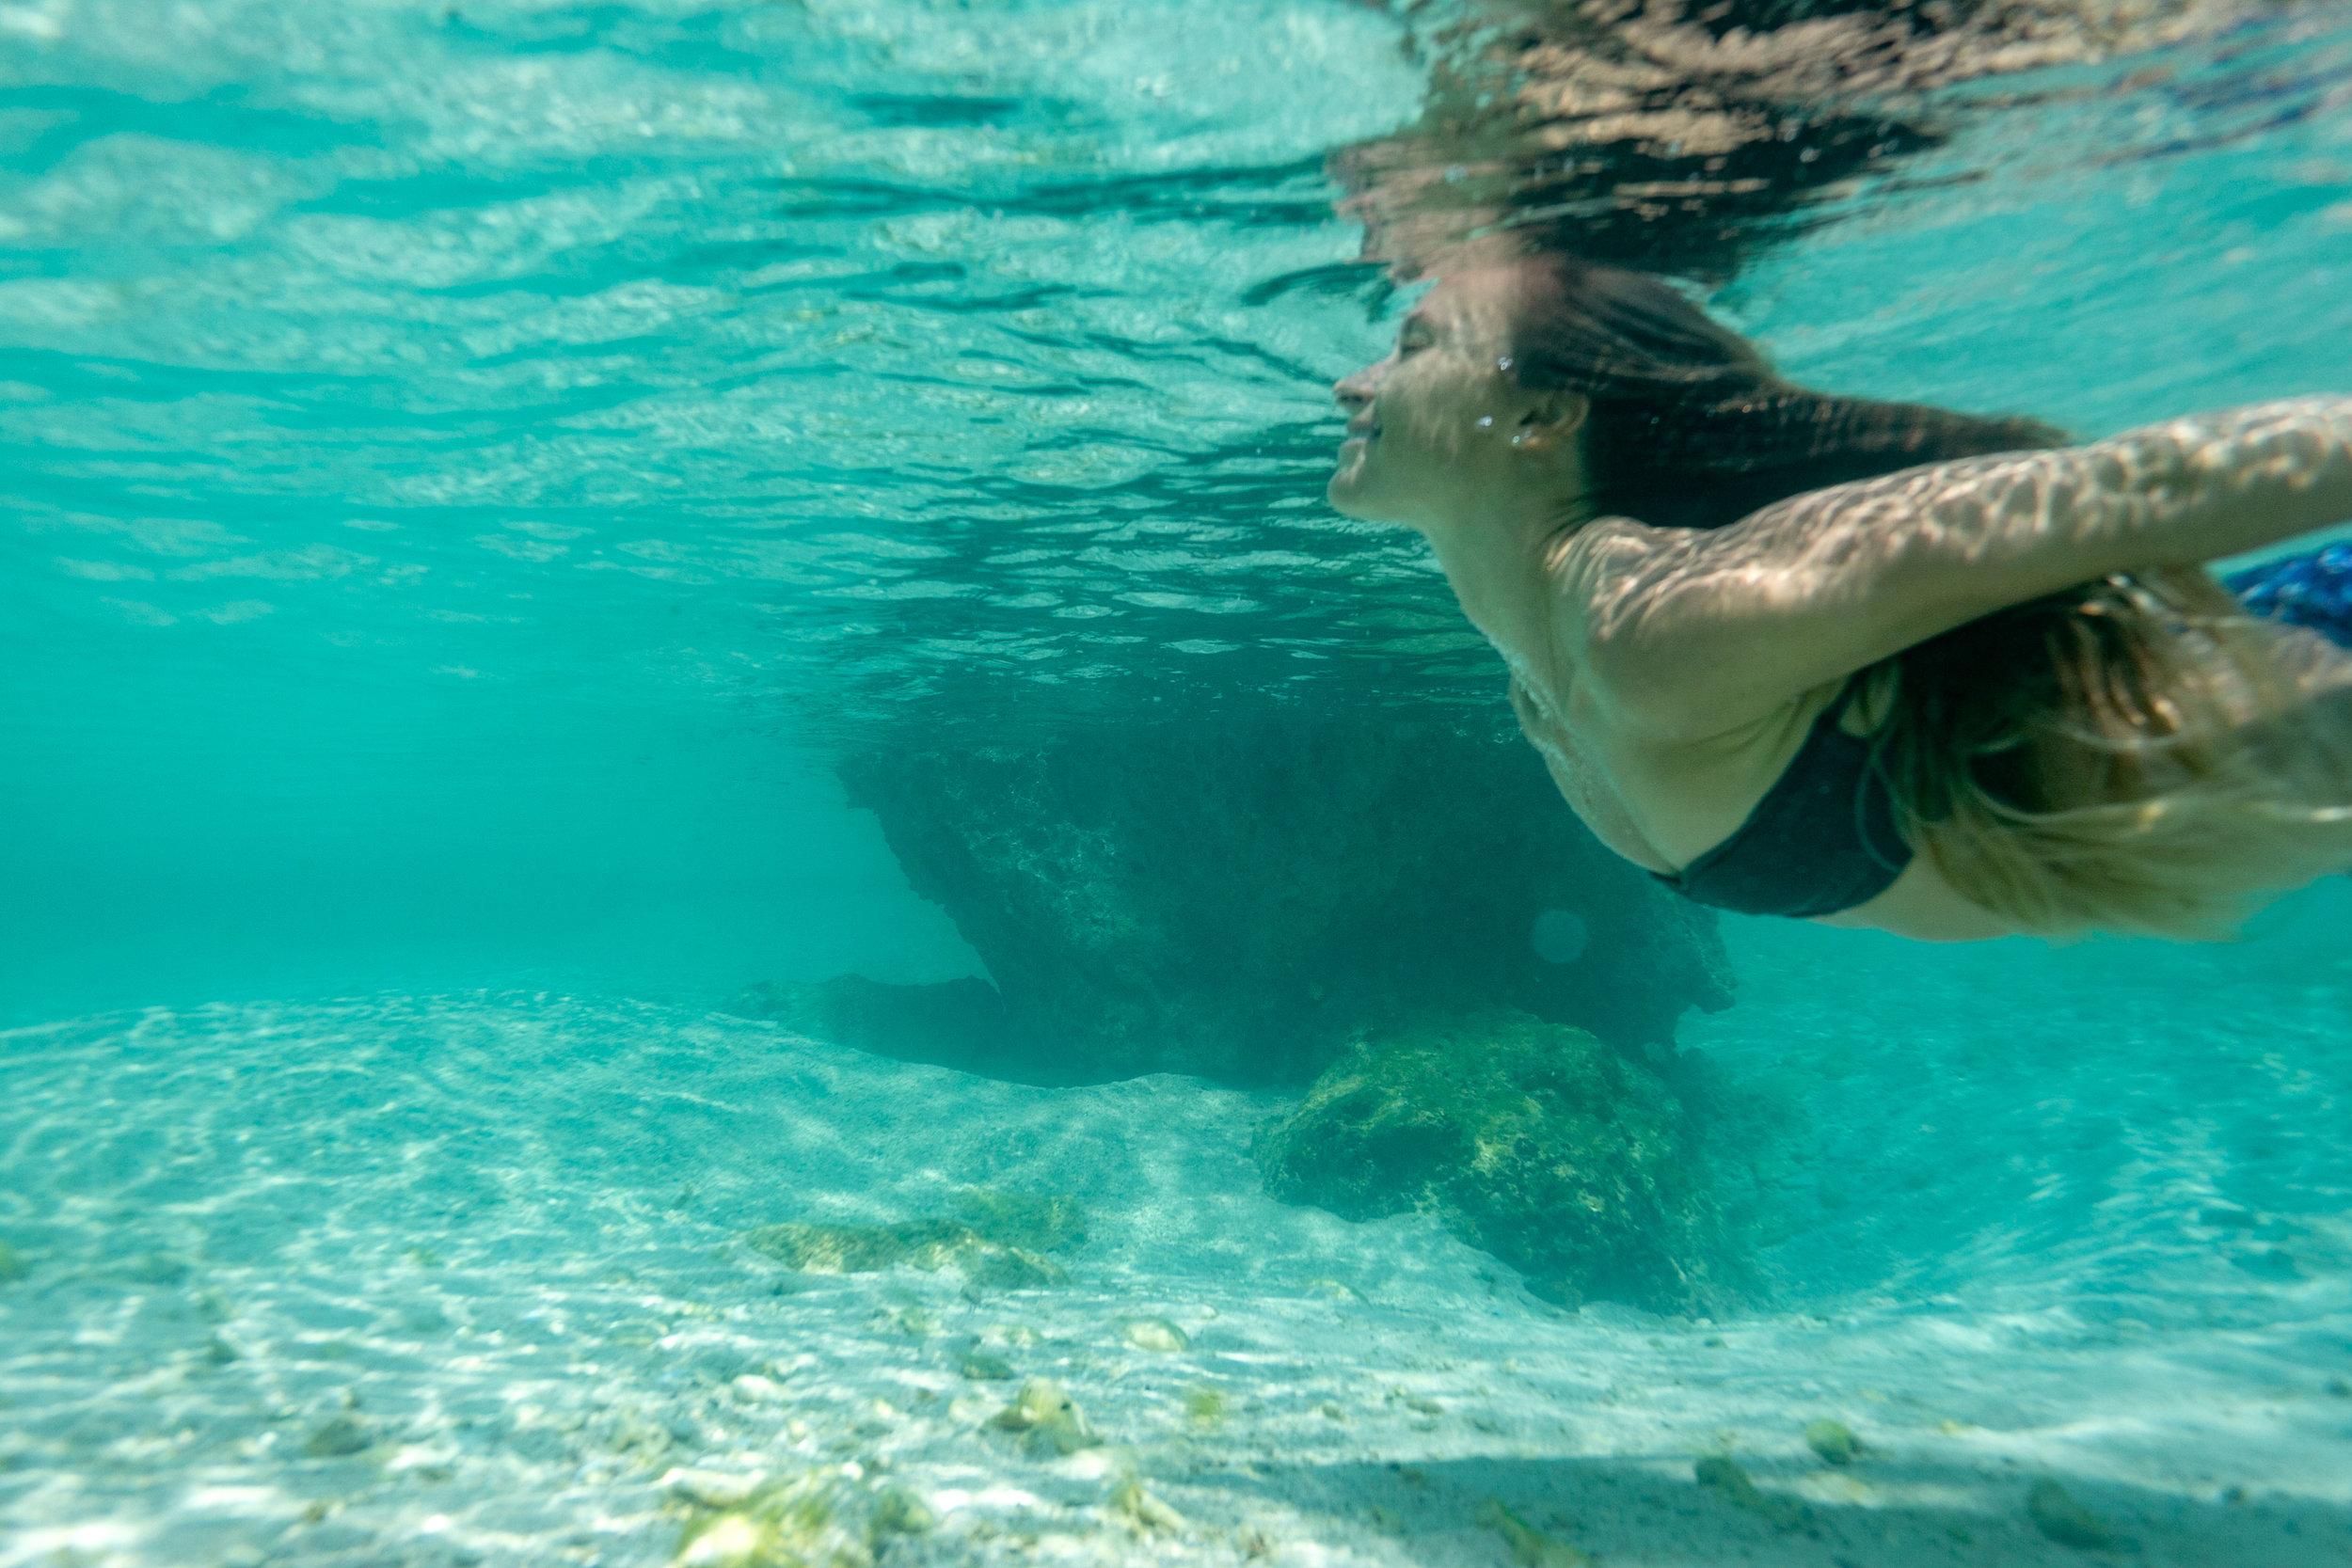 Mermaid-Fee1-SFW.jpg